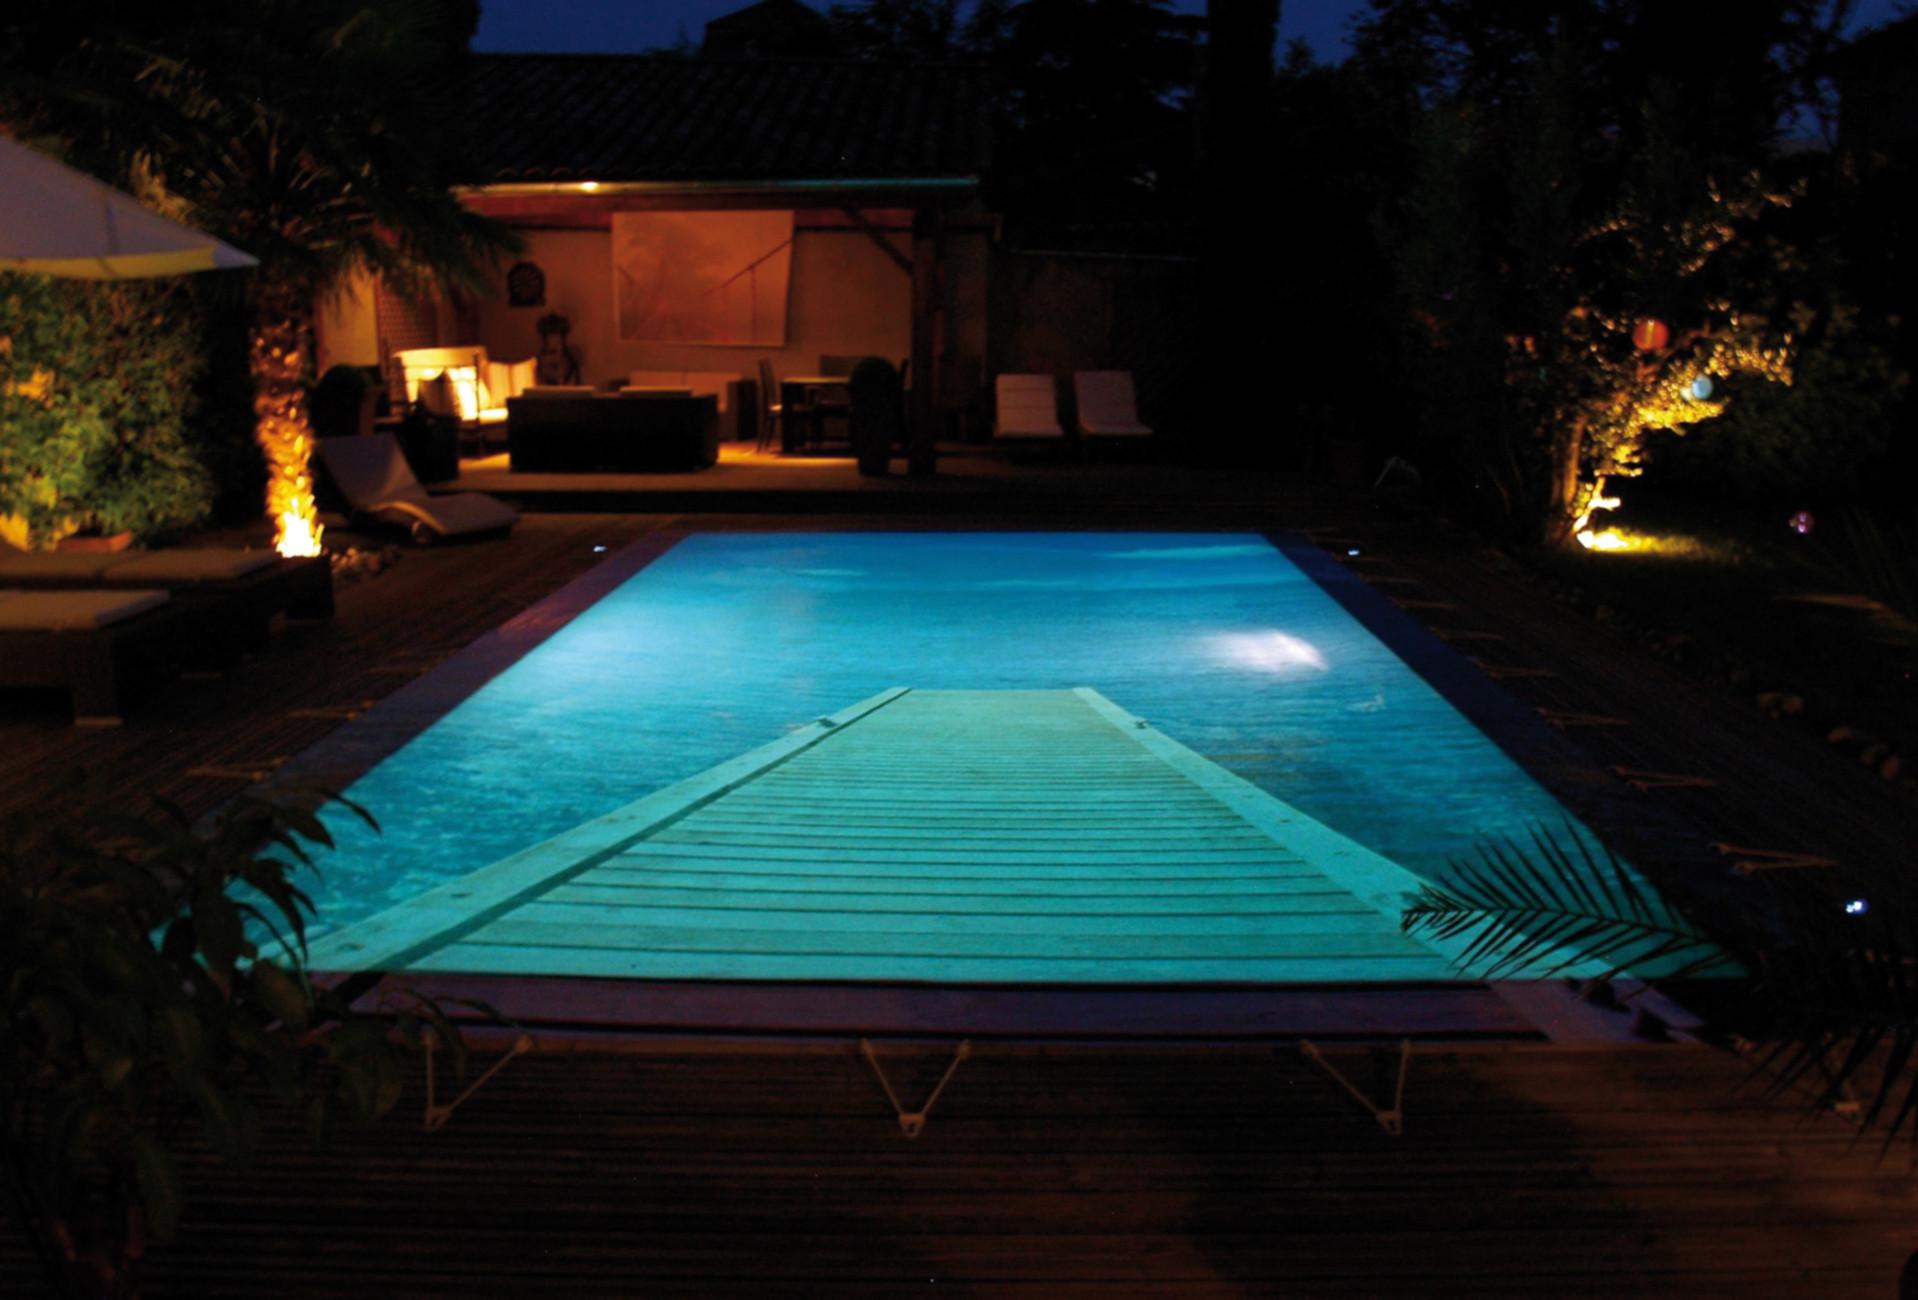 coperture invernali per piscine di design. Black Bedroom Furniture Sets. Home Design Ideas